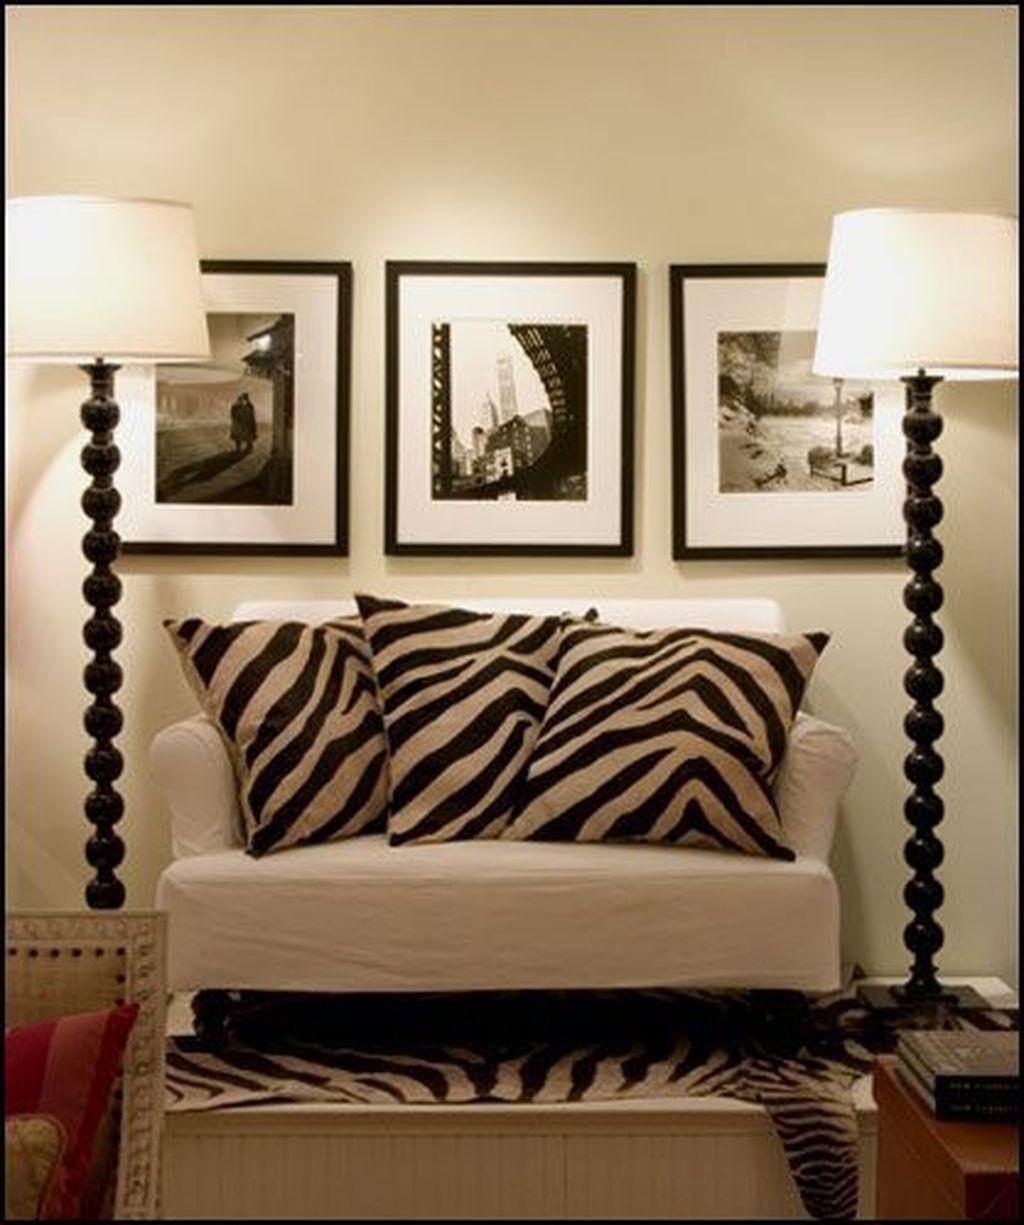 We Have A Major Design Crush On Bliss At Home Design Blogger Kristin Cadwallader S Living Room Follow Zebra Living Room African Living Rooms Home Living Room